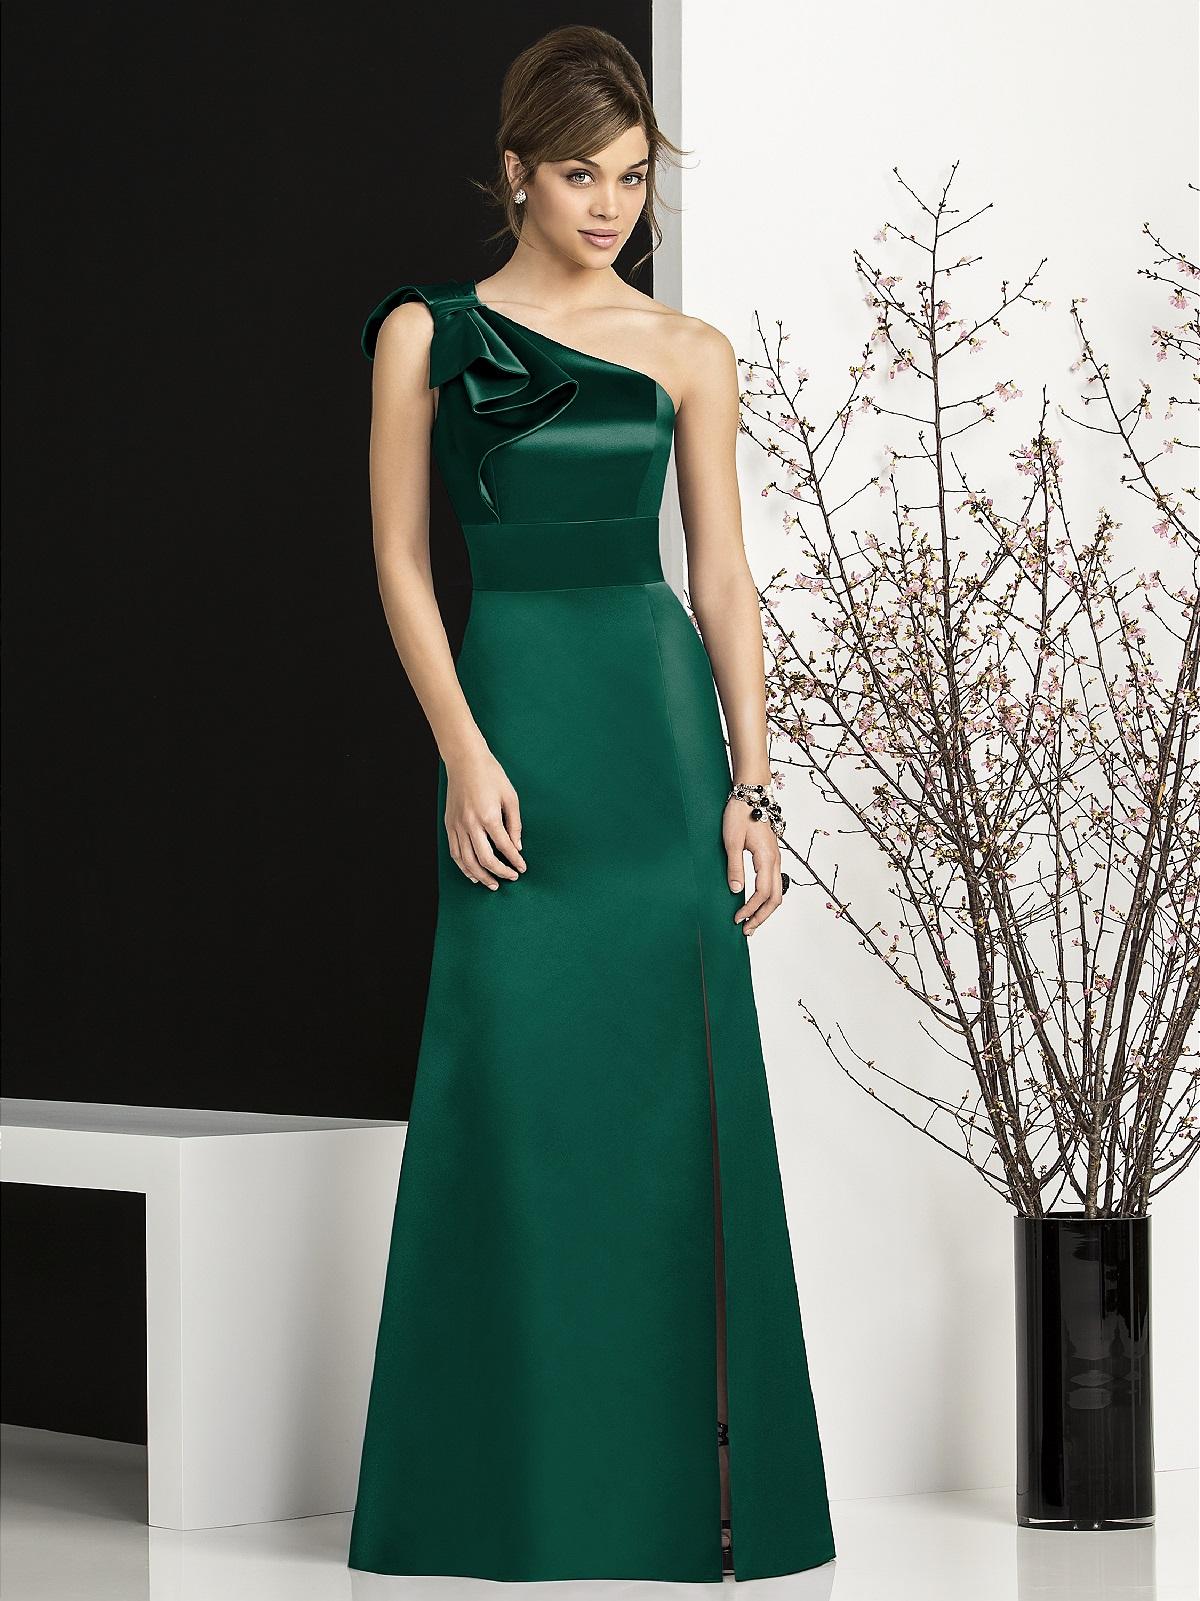 emerald green bridesmaid dresses uk emerald wedding dress Emerald Satin Gown Best Choice Always Fashion